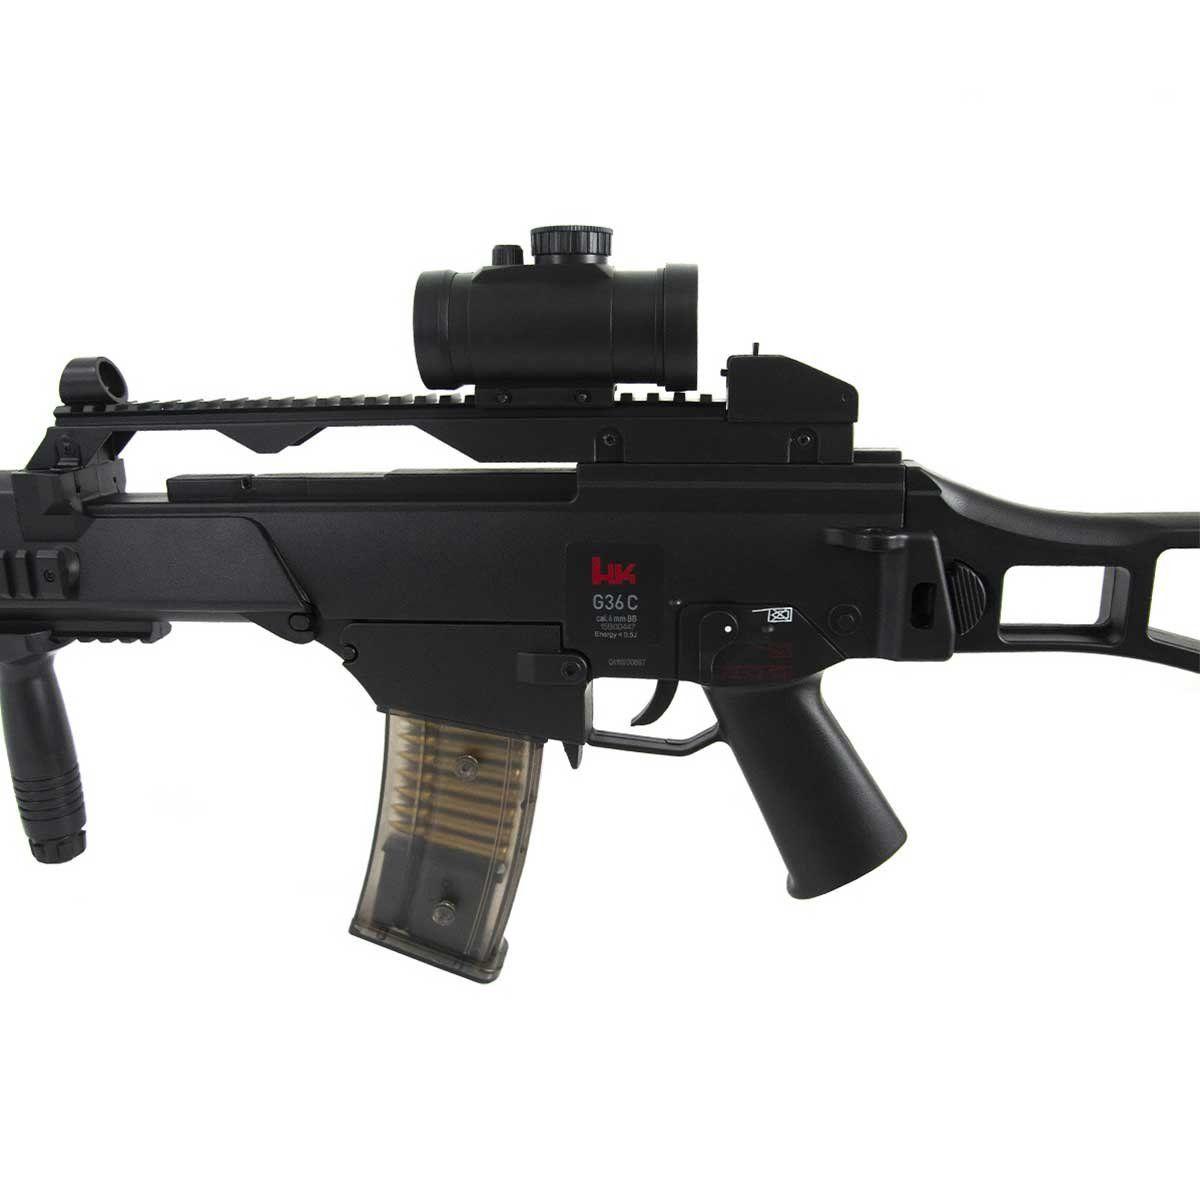 Rifle de Airsoft Heckler & Koch Umarex G36C Elétrico 6mm